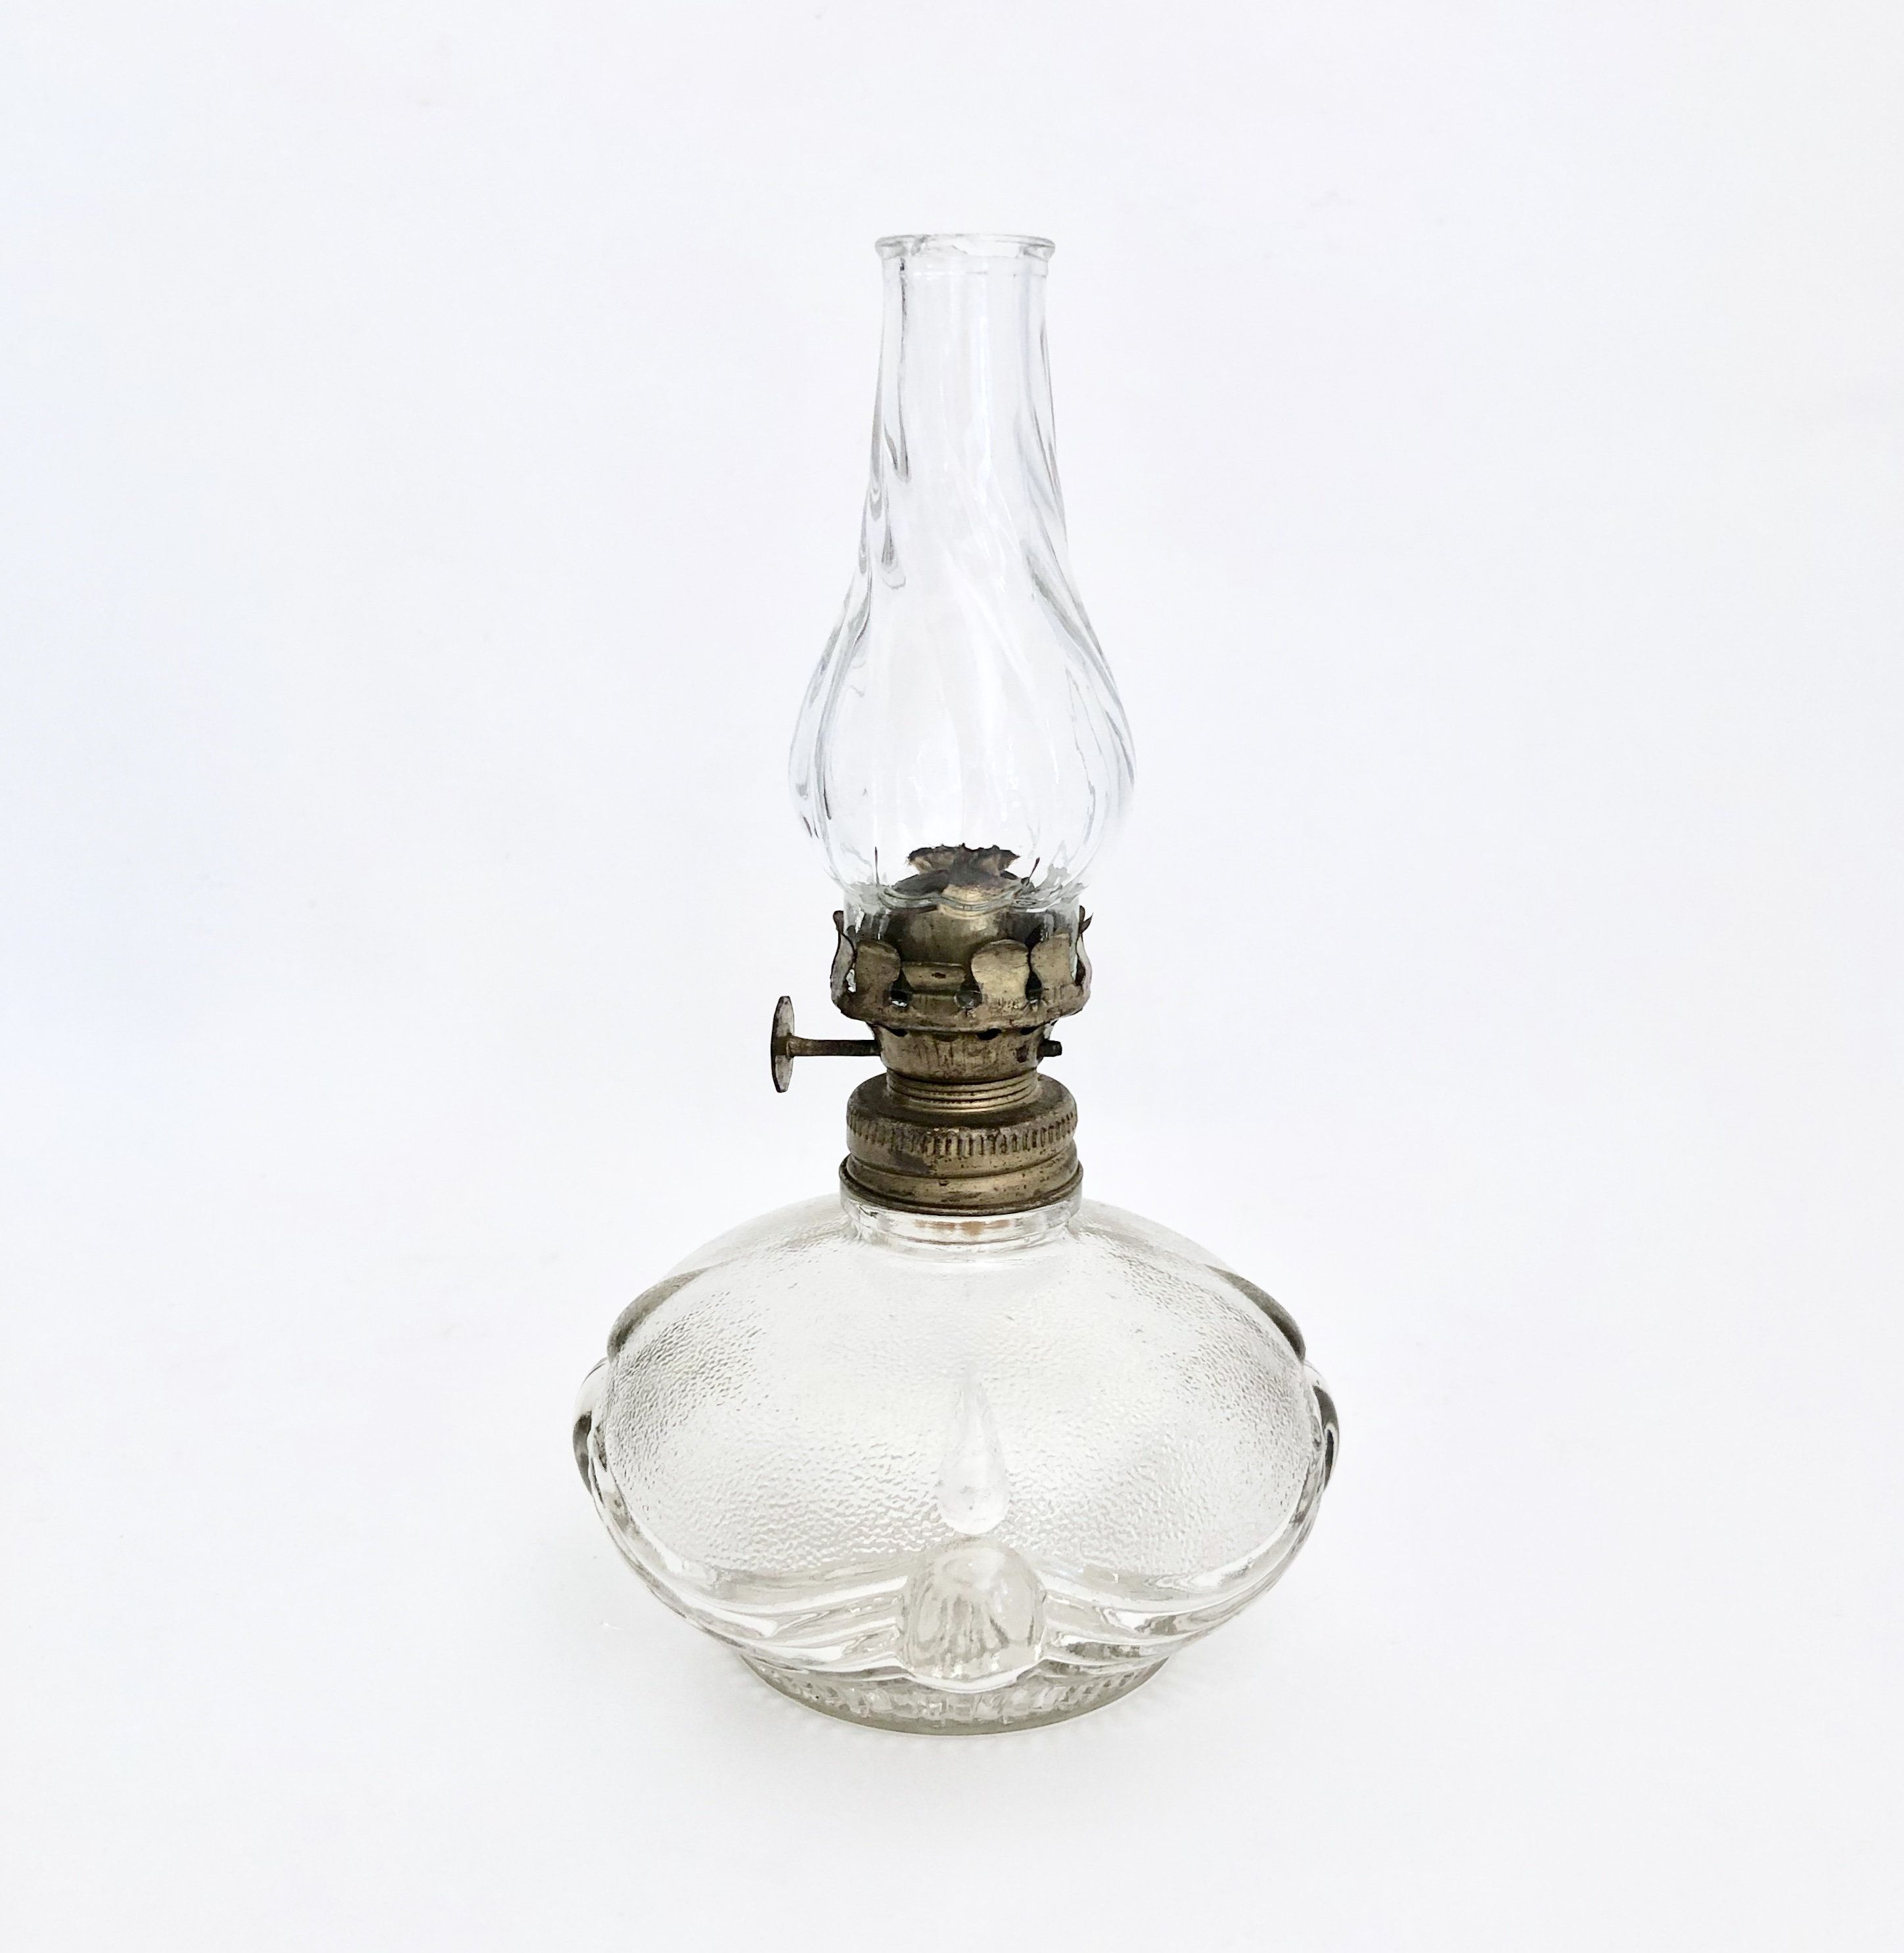 Vintage Oil Lamp 1940s Miniature Oil Lamp Miniature Hurricane Lamp Victorian Decor Collectible Glass Oil Lamp Farmhous Oil Lamps Lamp Designer Drapes